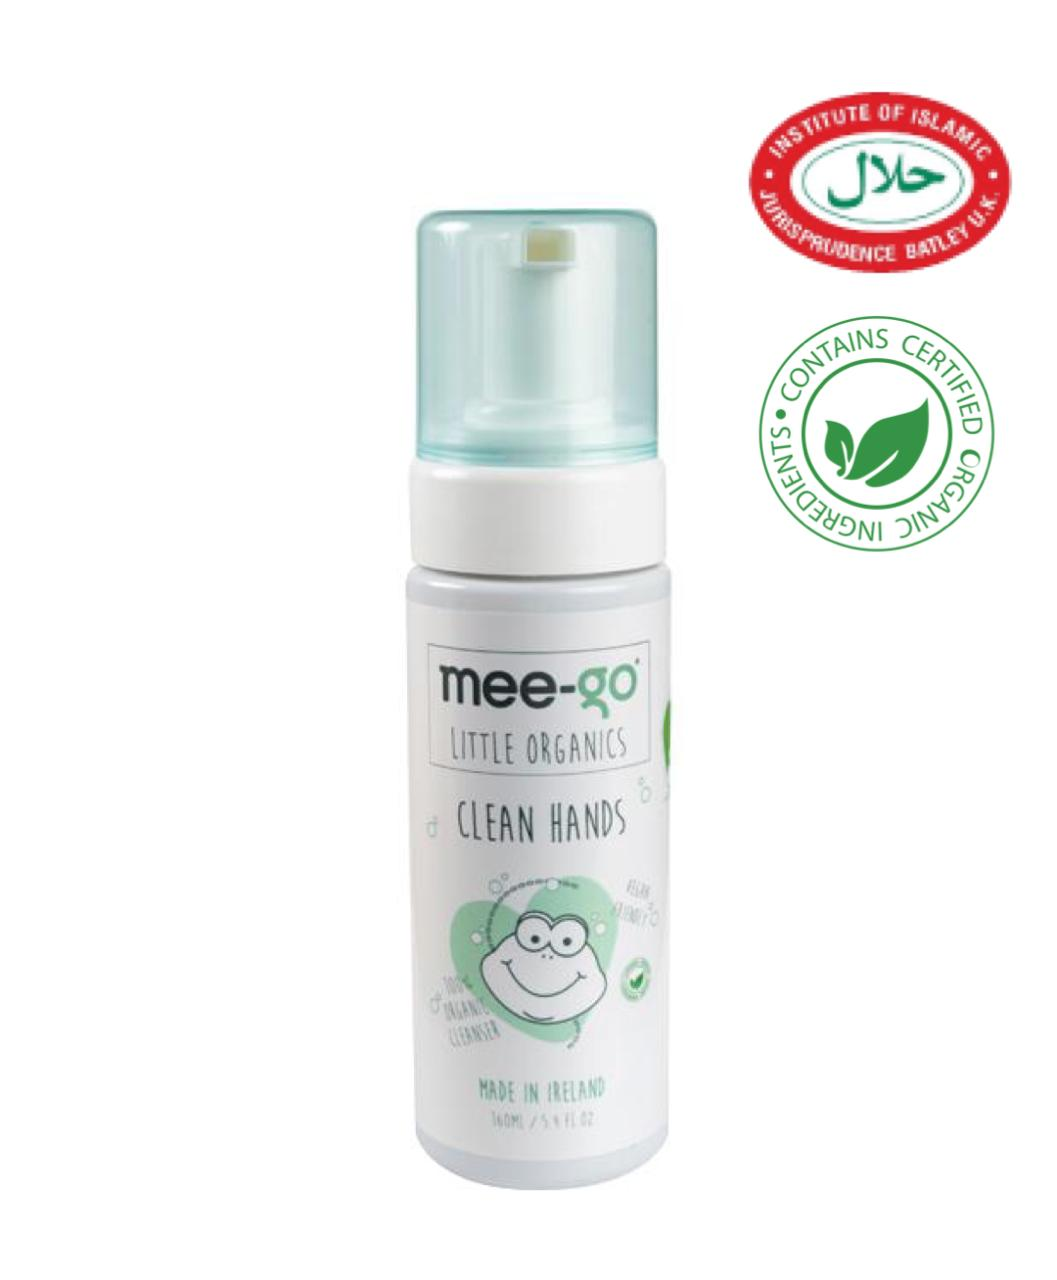 Mee-go little organics clean hands halal sanitizing foam